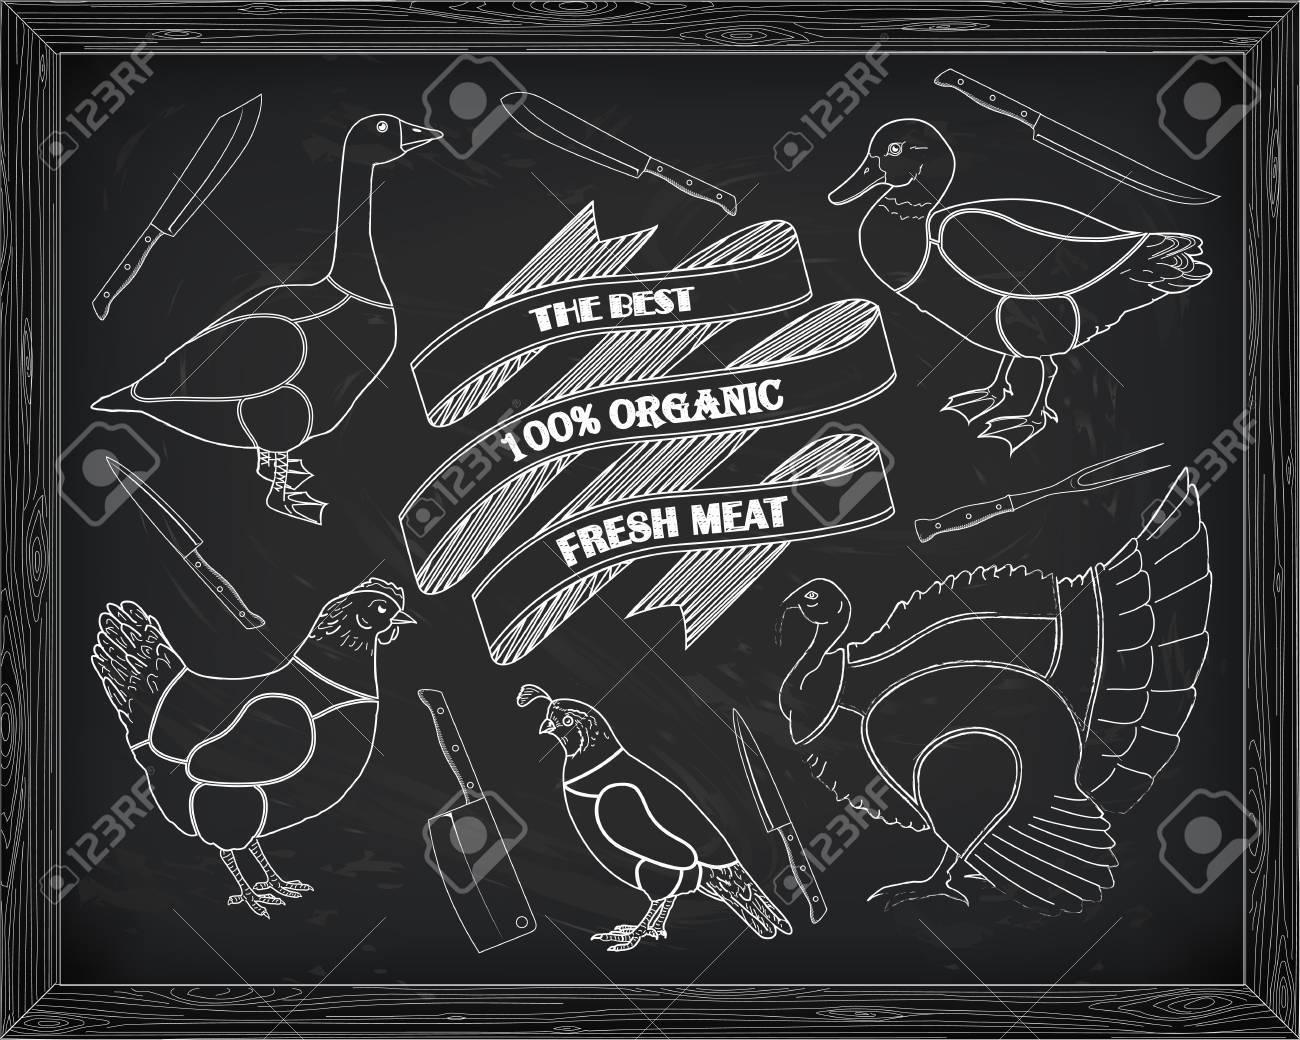 Quail Meat Cuts Diagram Switch Chickencutsdiagram Beautiful Scheme Cutting Chicken Turkey Duck Goose Drawn Rh 123rf Com Beef Steak Lamb